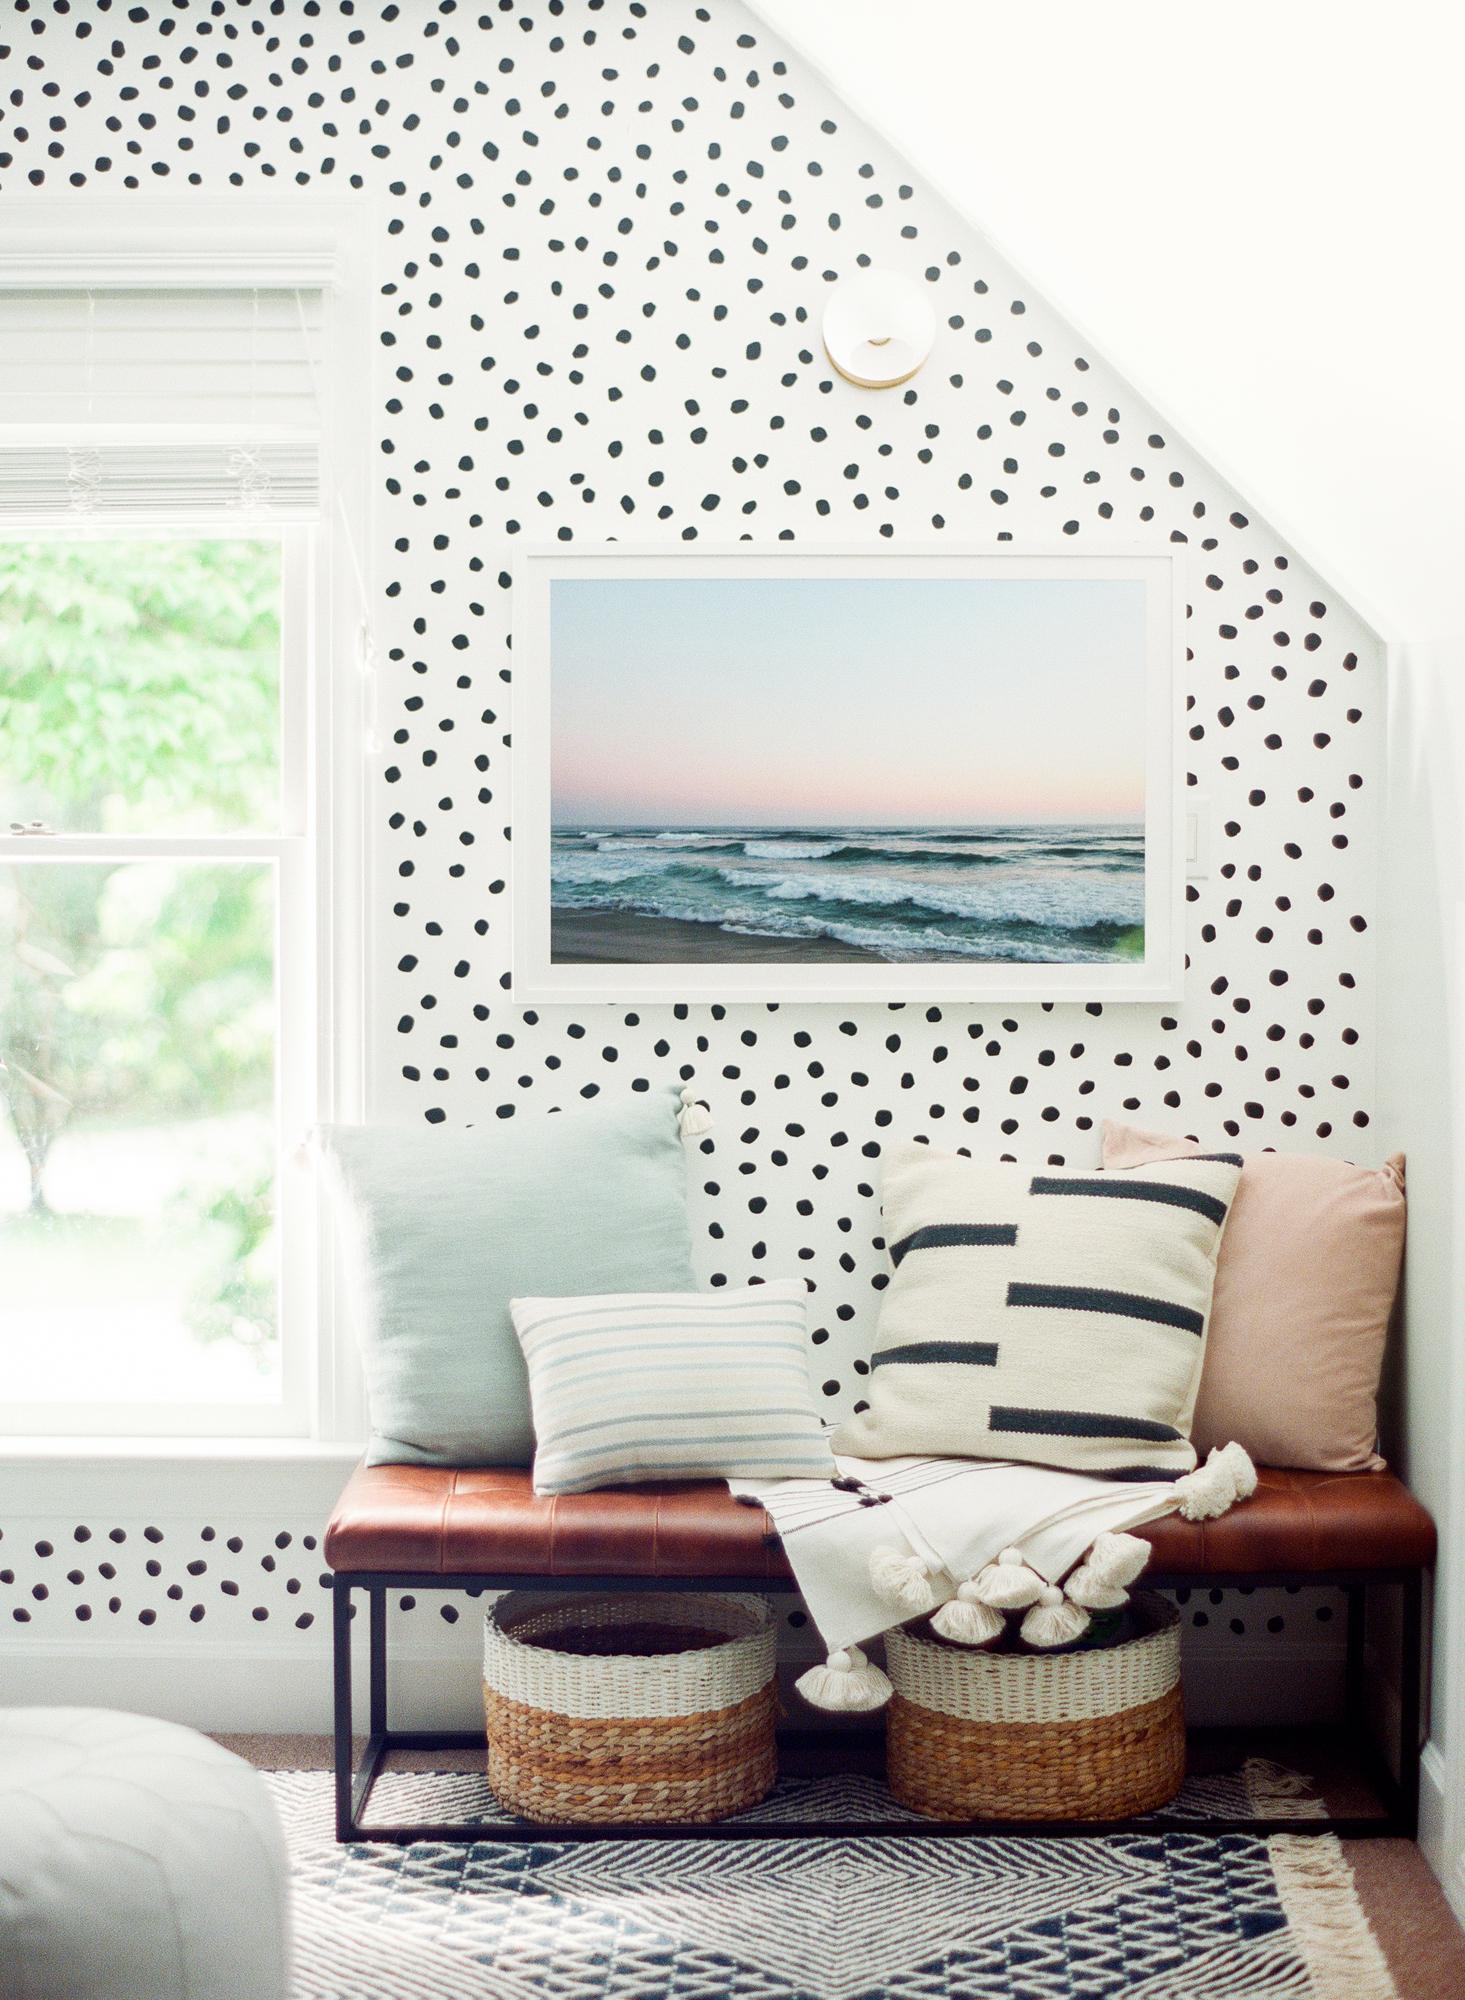 raleigh-interior-home-photographer-branding-business-headshot-photography-001